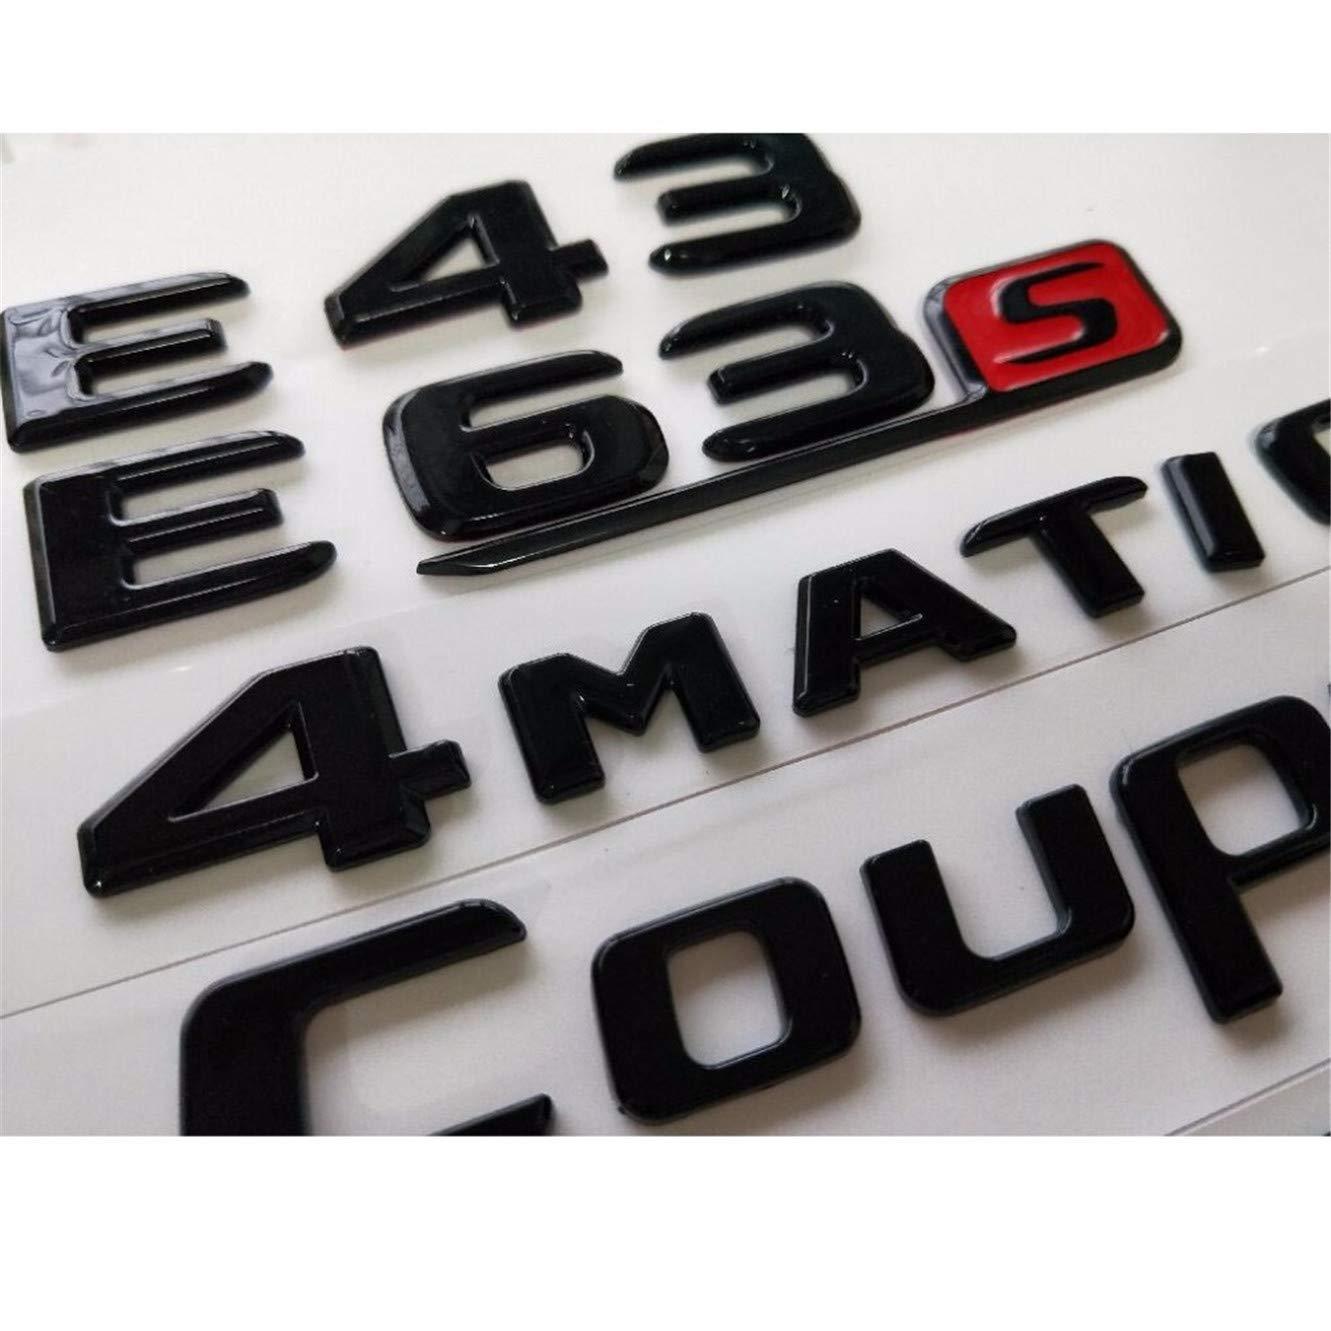 GLE63S Letter Trunk Emblem Rear Badge Sticker Mercedes Benz AMG GLE 63 GLE63 S